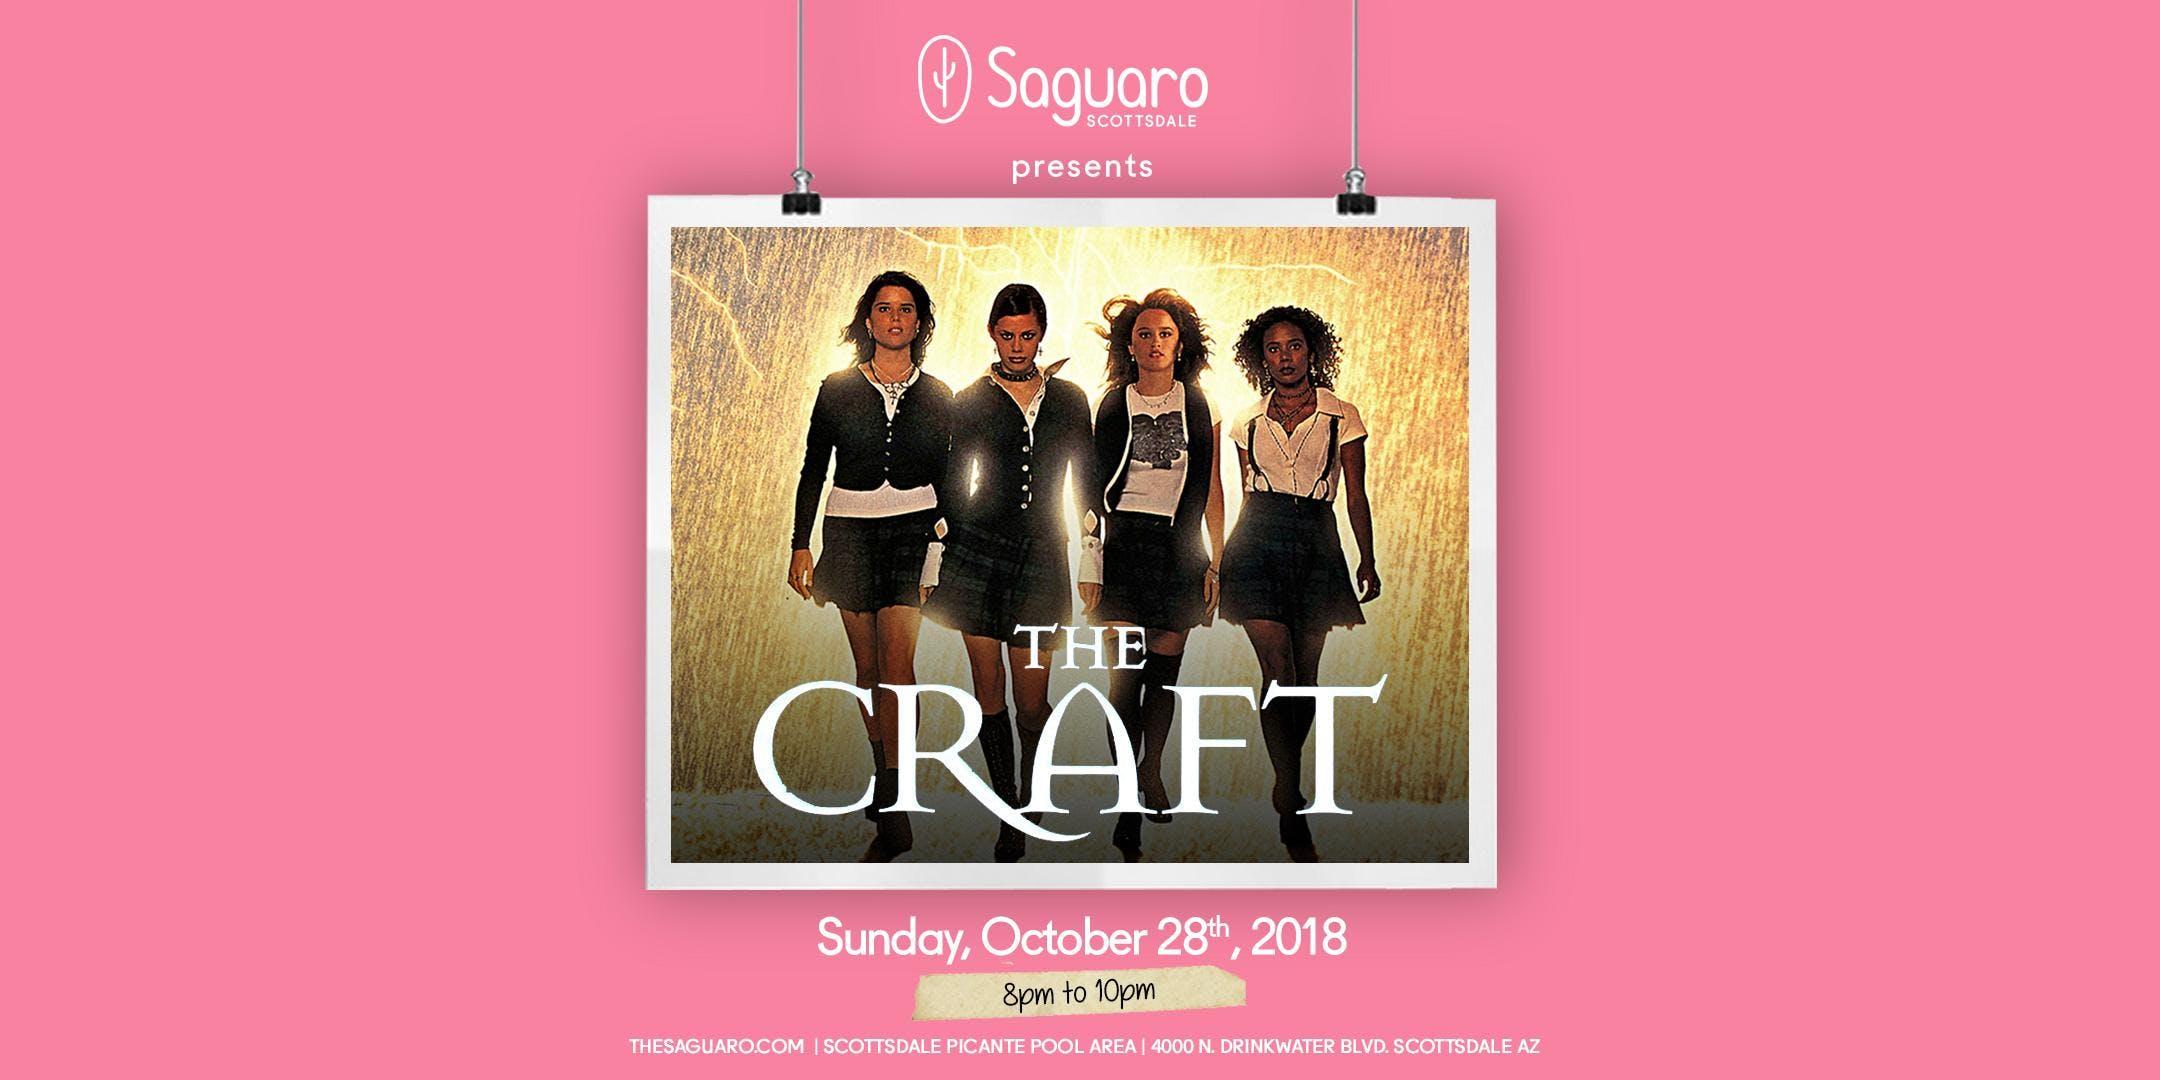 The Saguaro Scottsdale screening of 'The Craft'